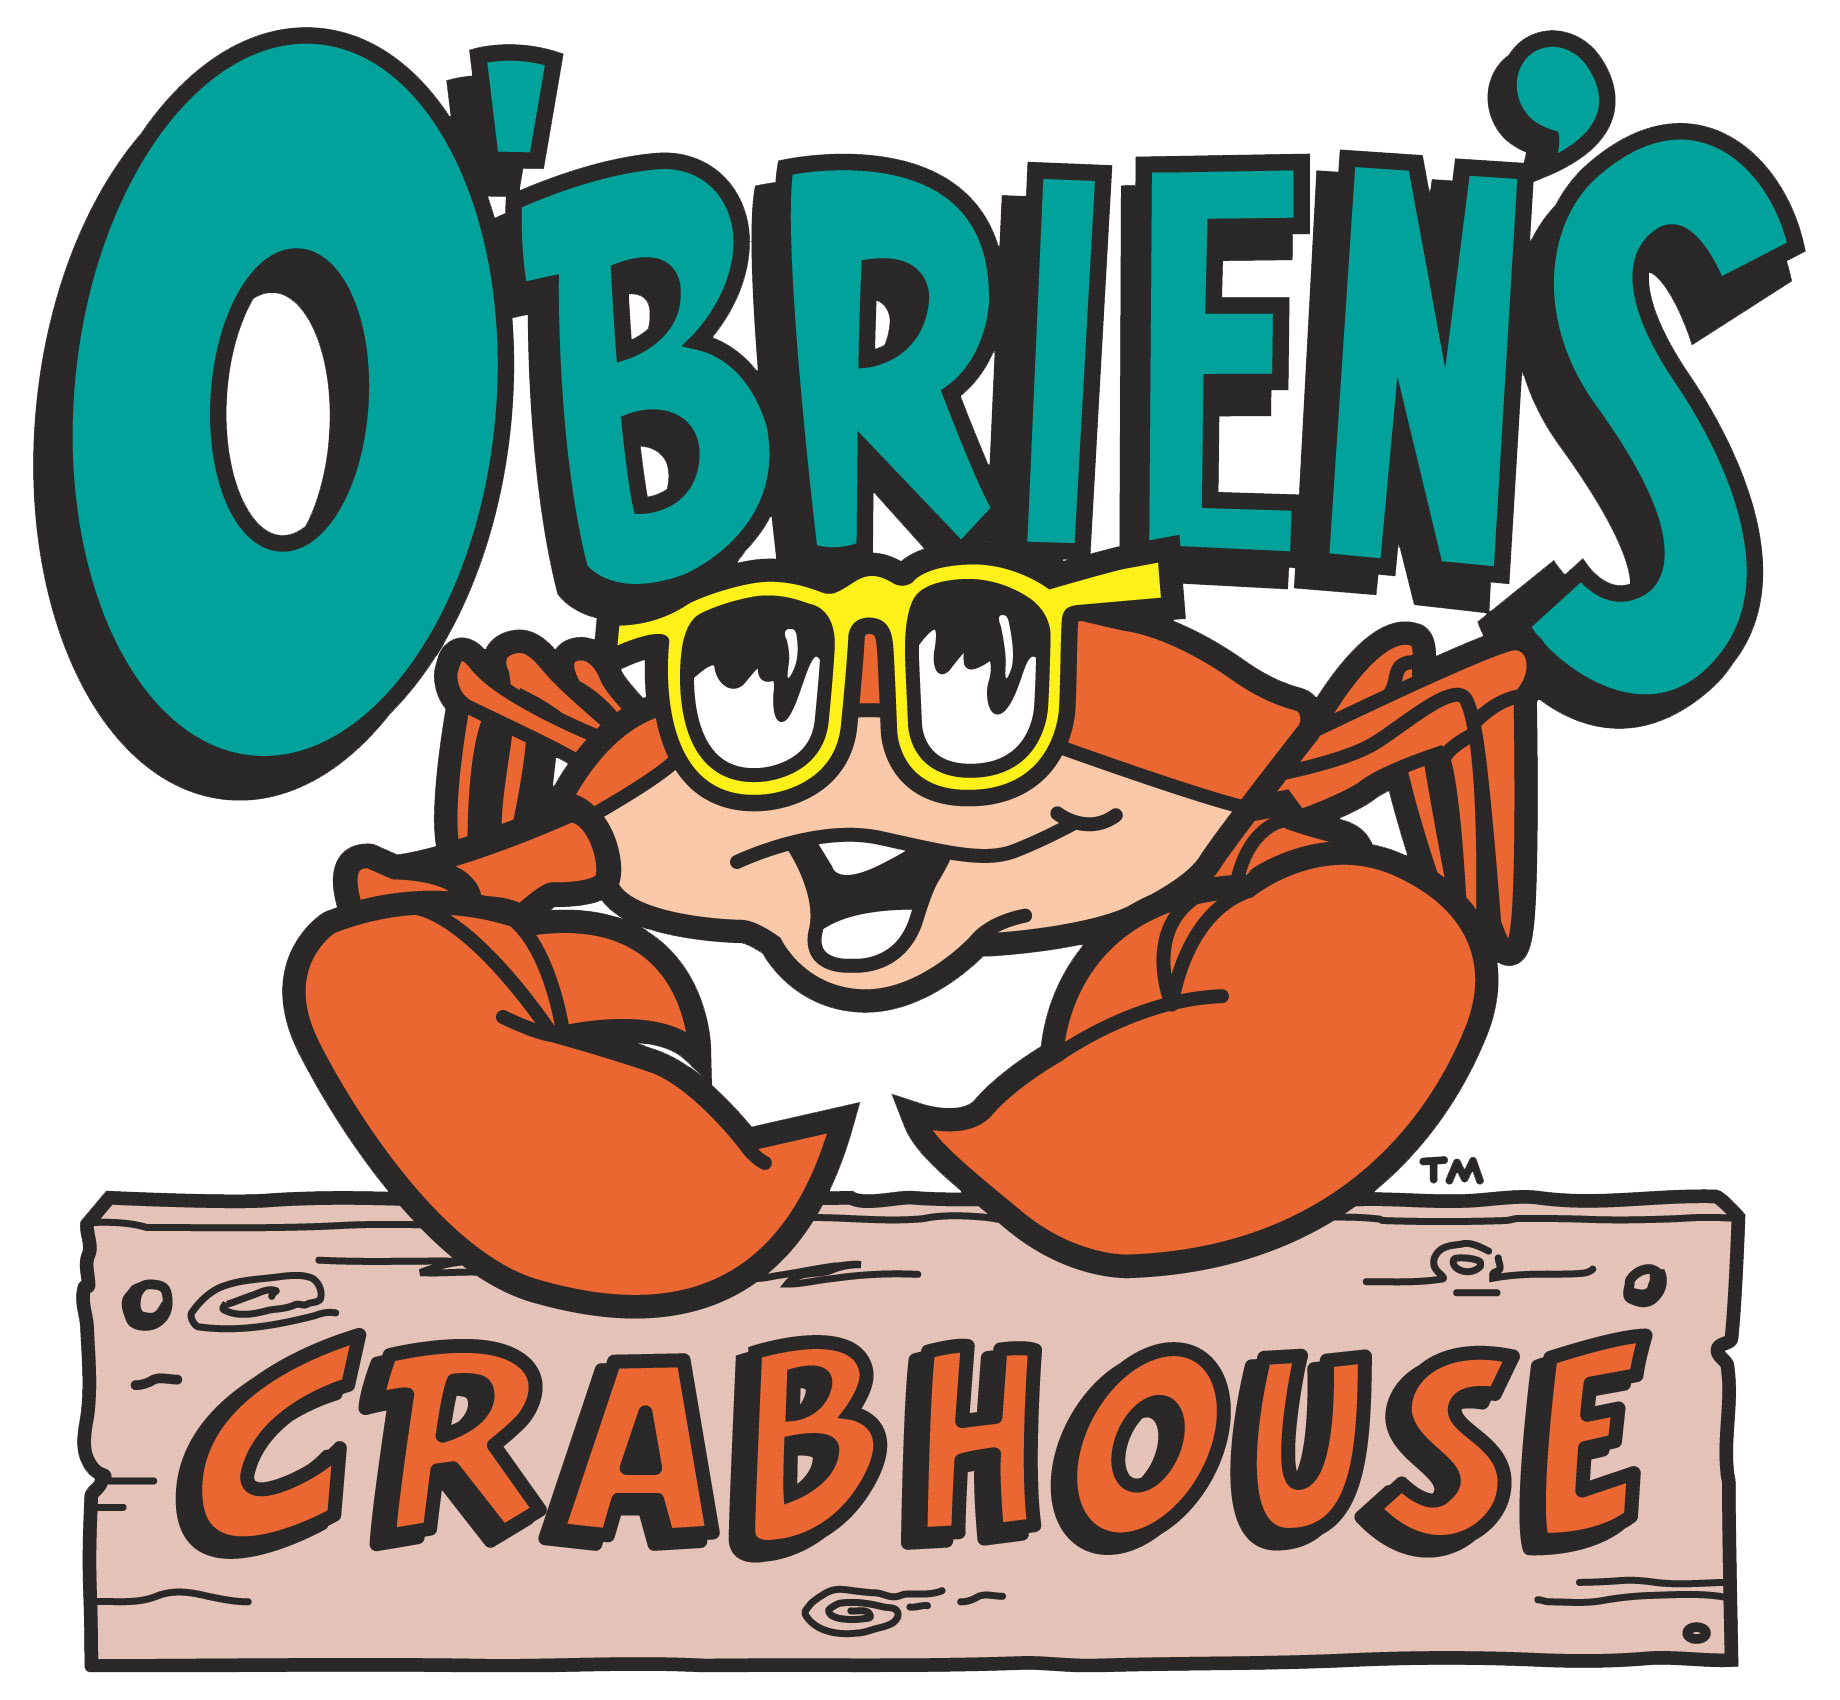 Obrien's Crabhouse logo